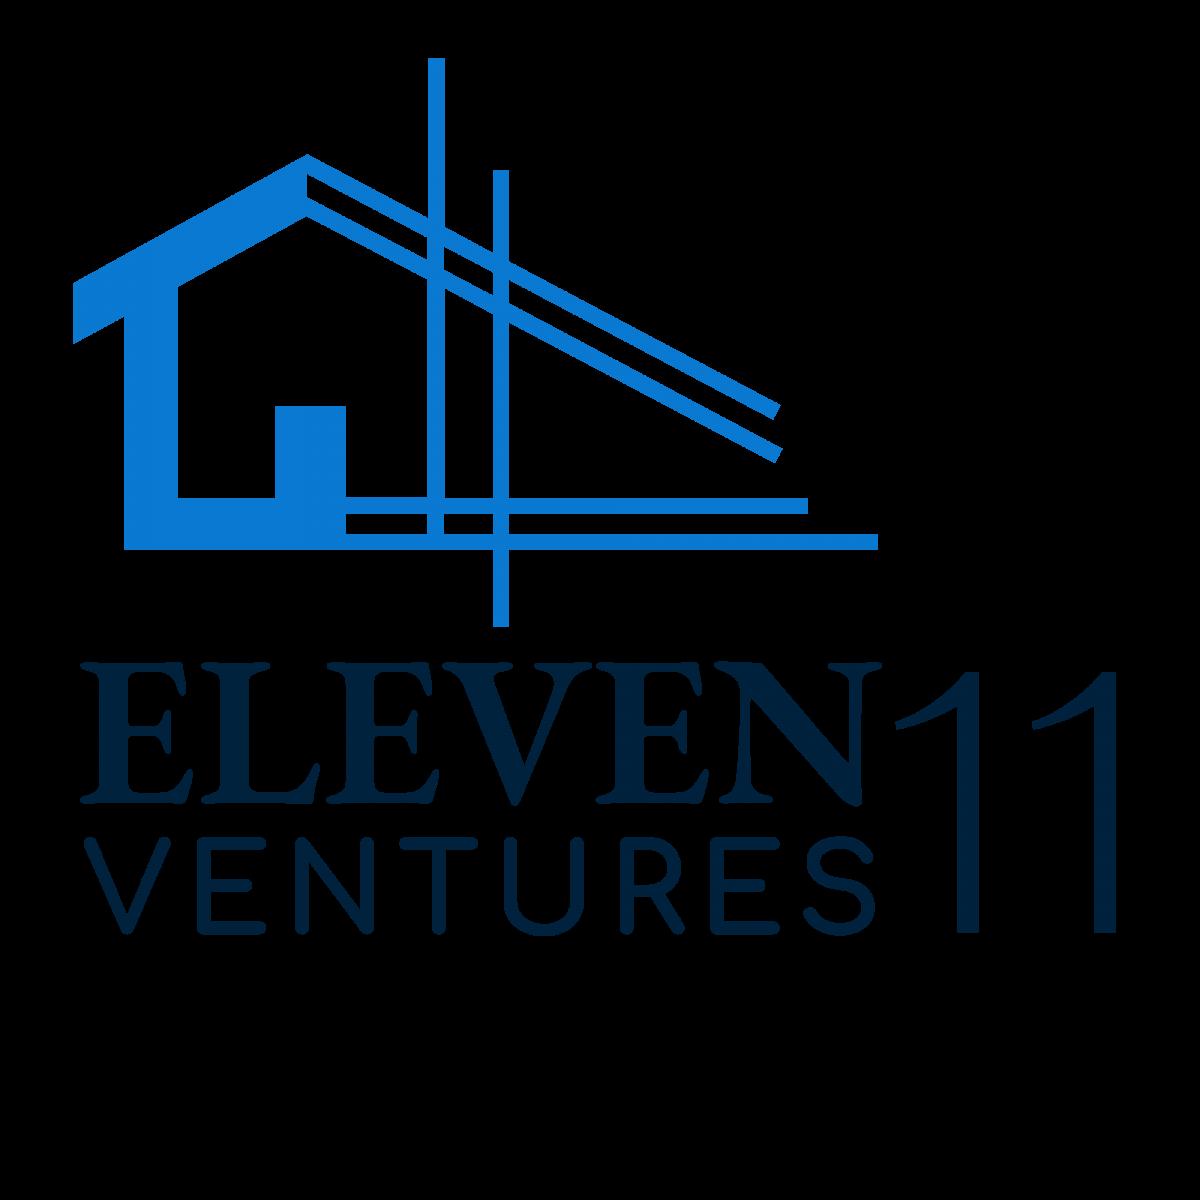 Eleven 11 Ventures logo